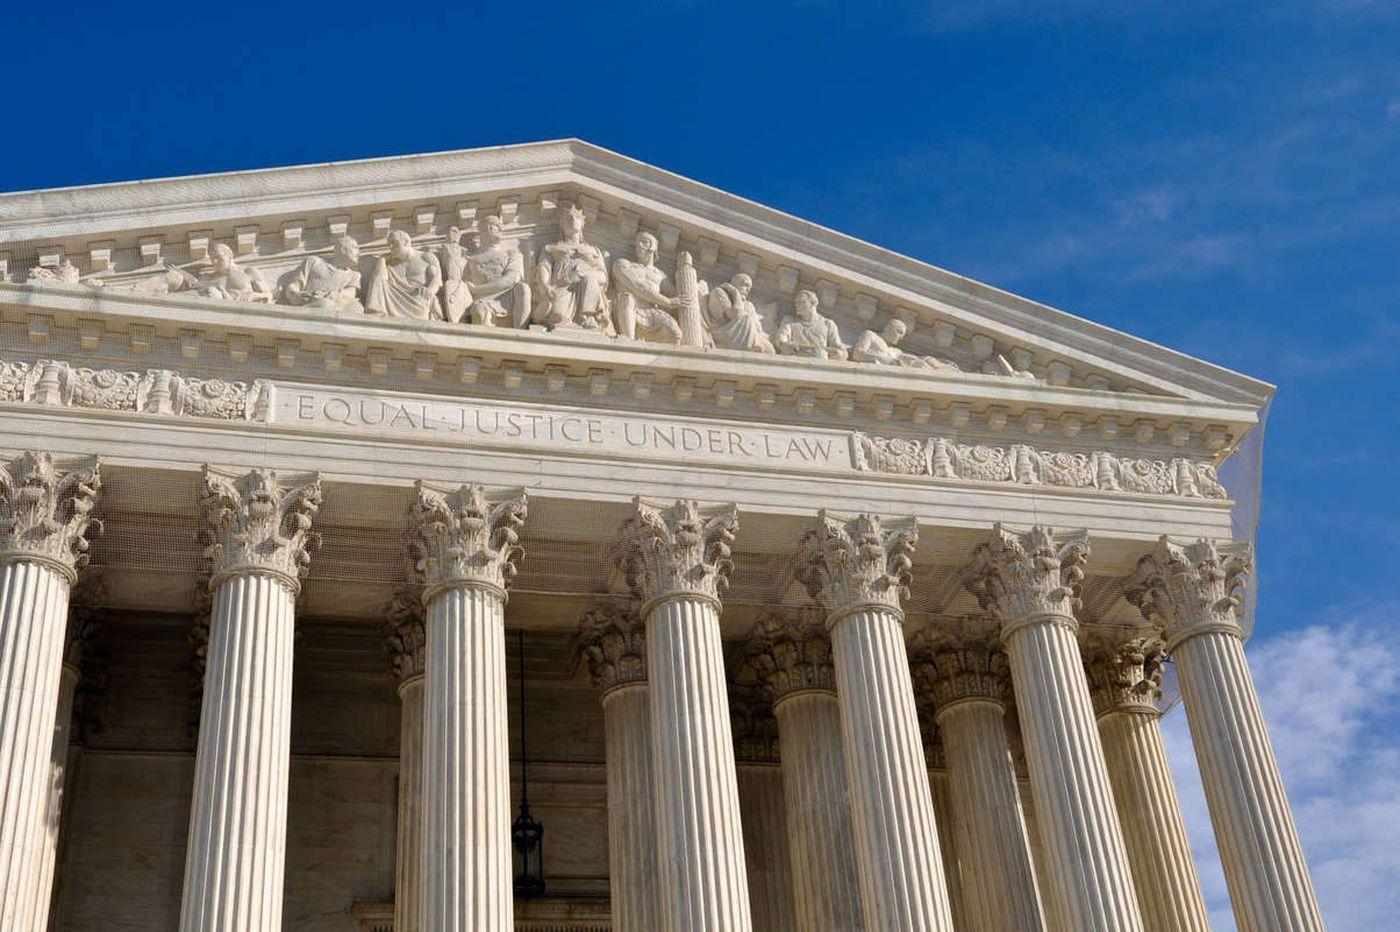 Pa. Republicans ask U.S. Supreme Court to halt redistricting order